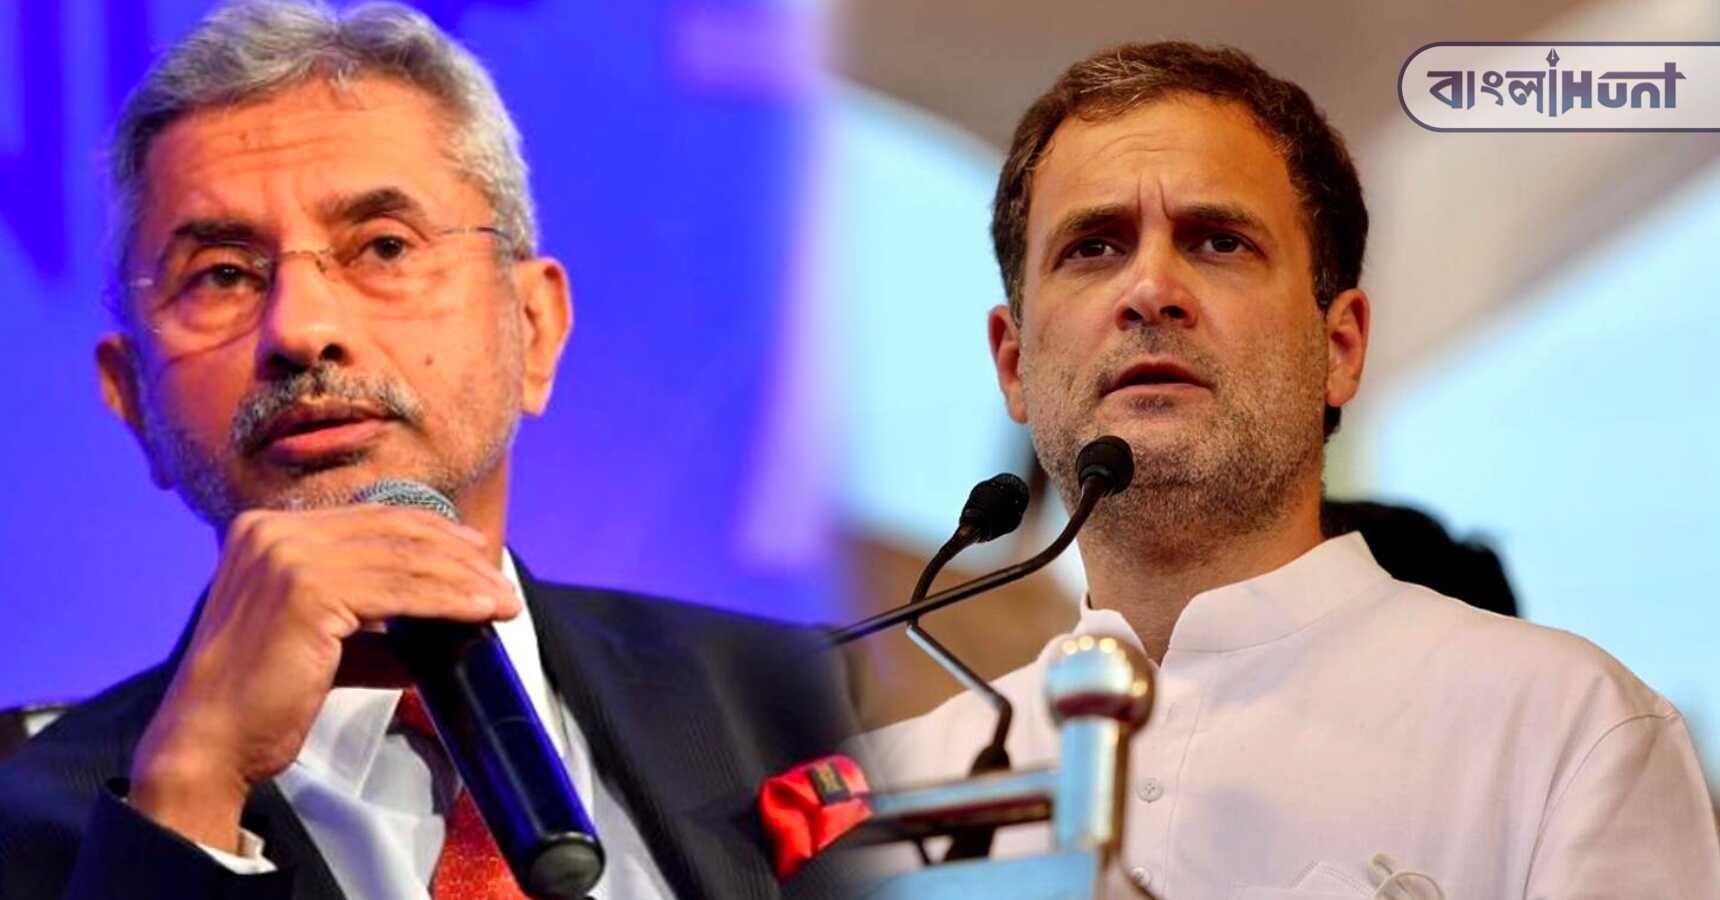 Rahul Gandhi was dividing the country through politics, Subrahmanyam Jaishankar replied